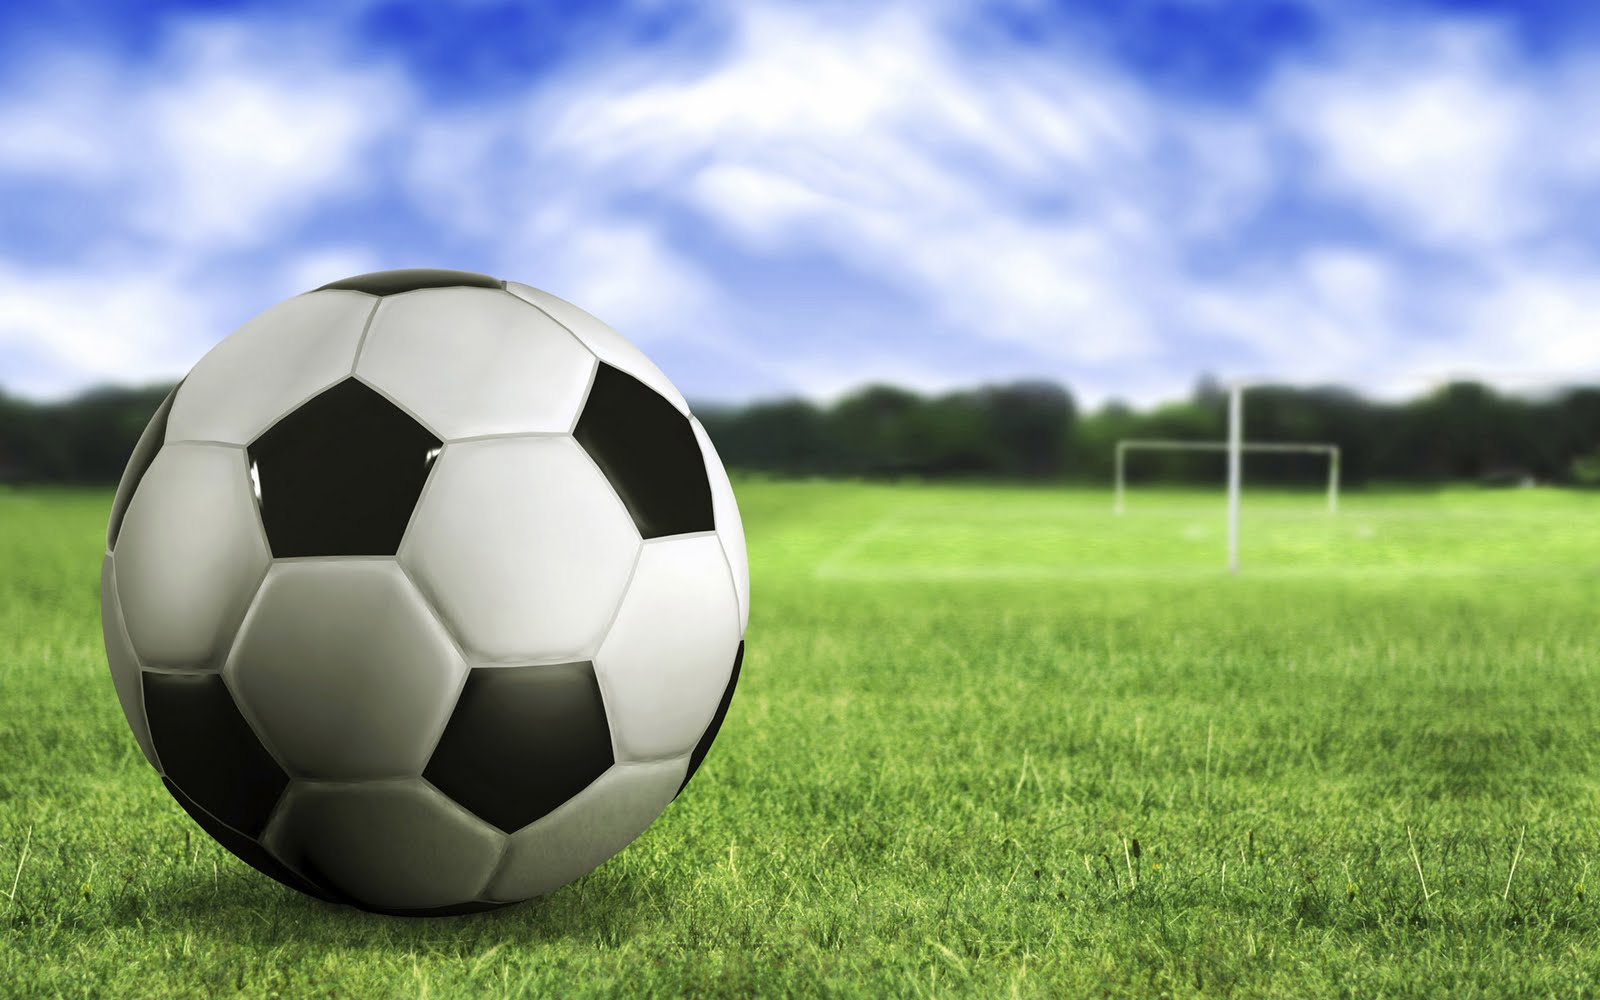 Football Wallpaper: HD Football Soccer Wallpaper Pictures